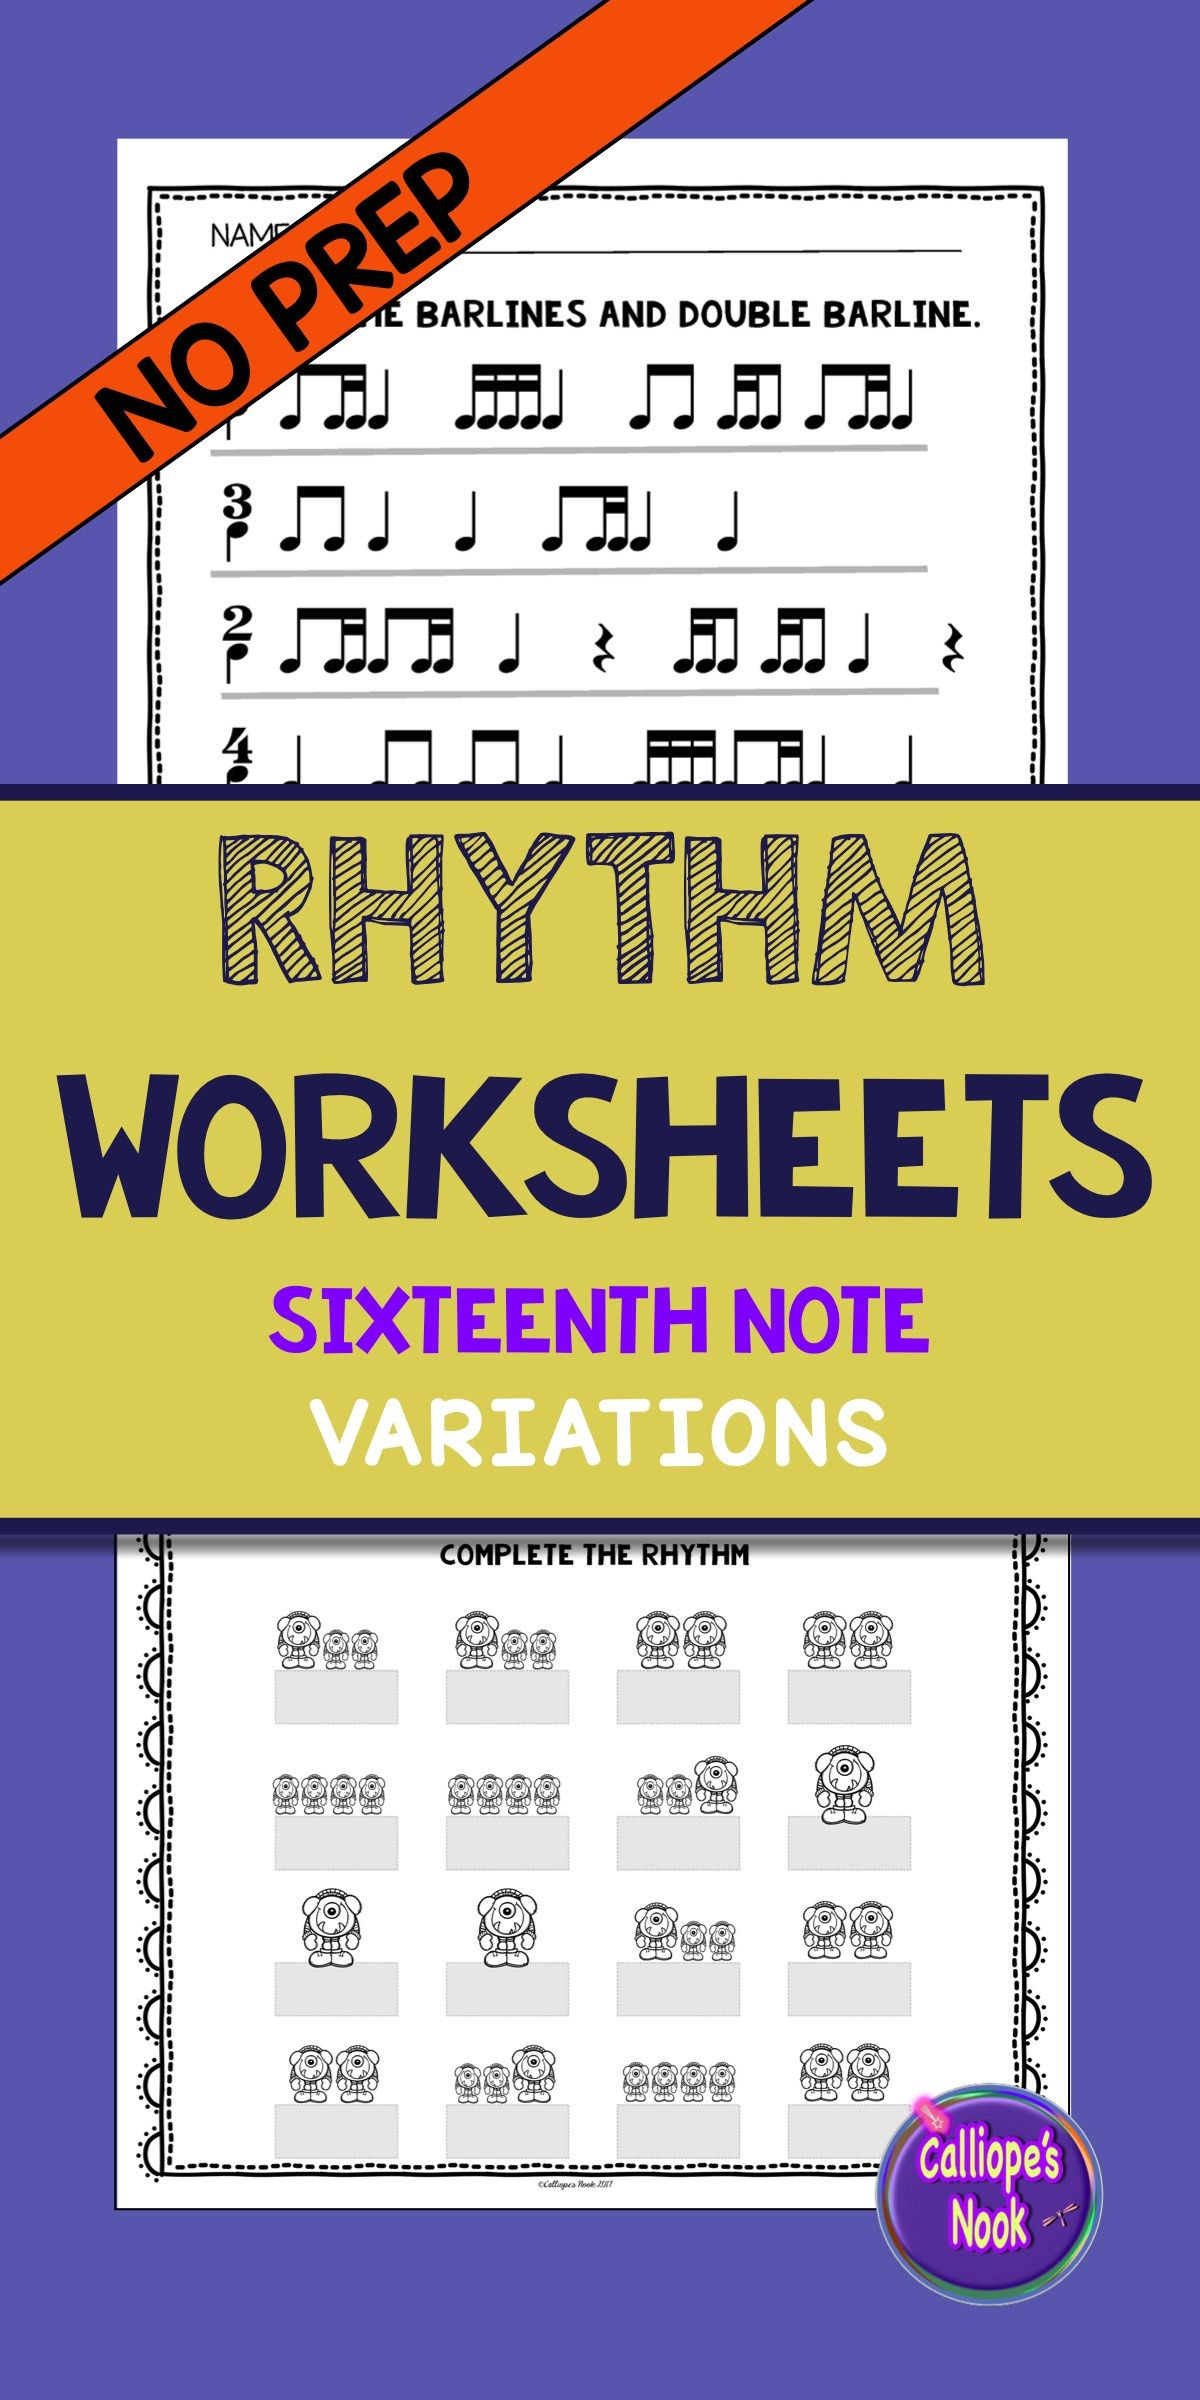 No Prep Rhythm Worksheets Sixteenth Note Variations Ti Tika Tika Ti